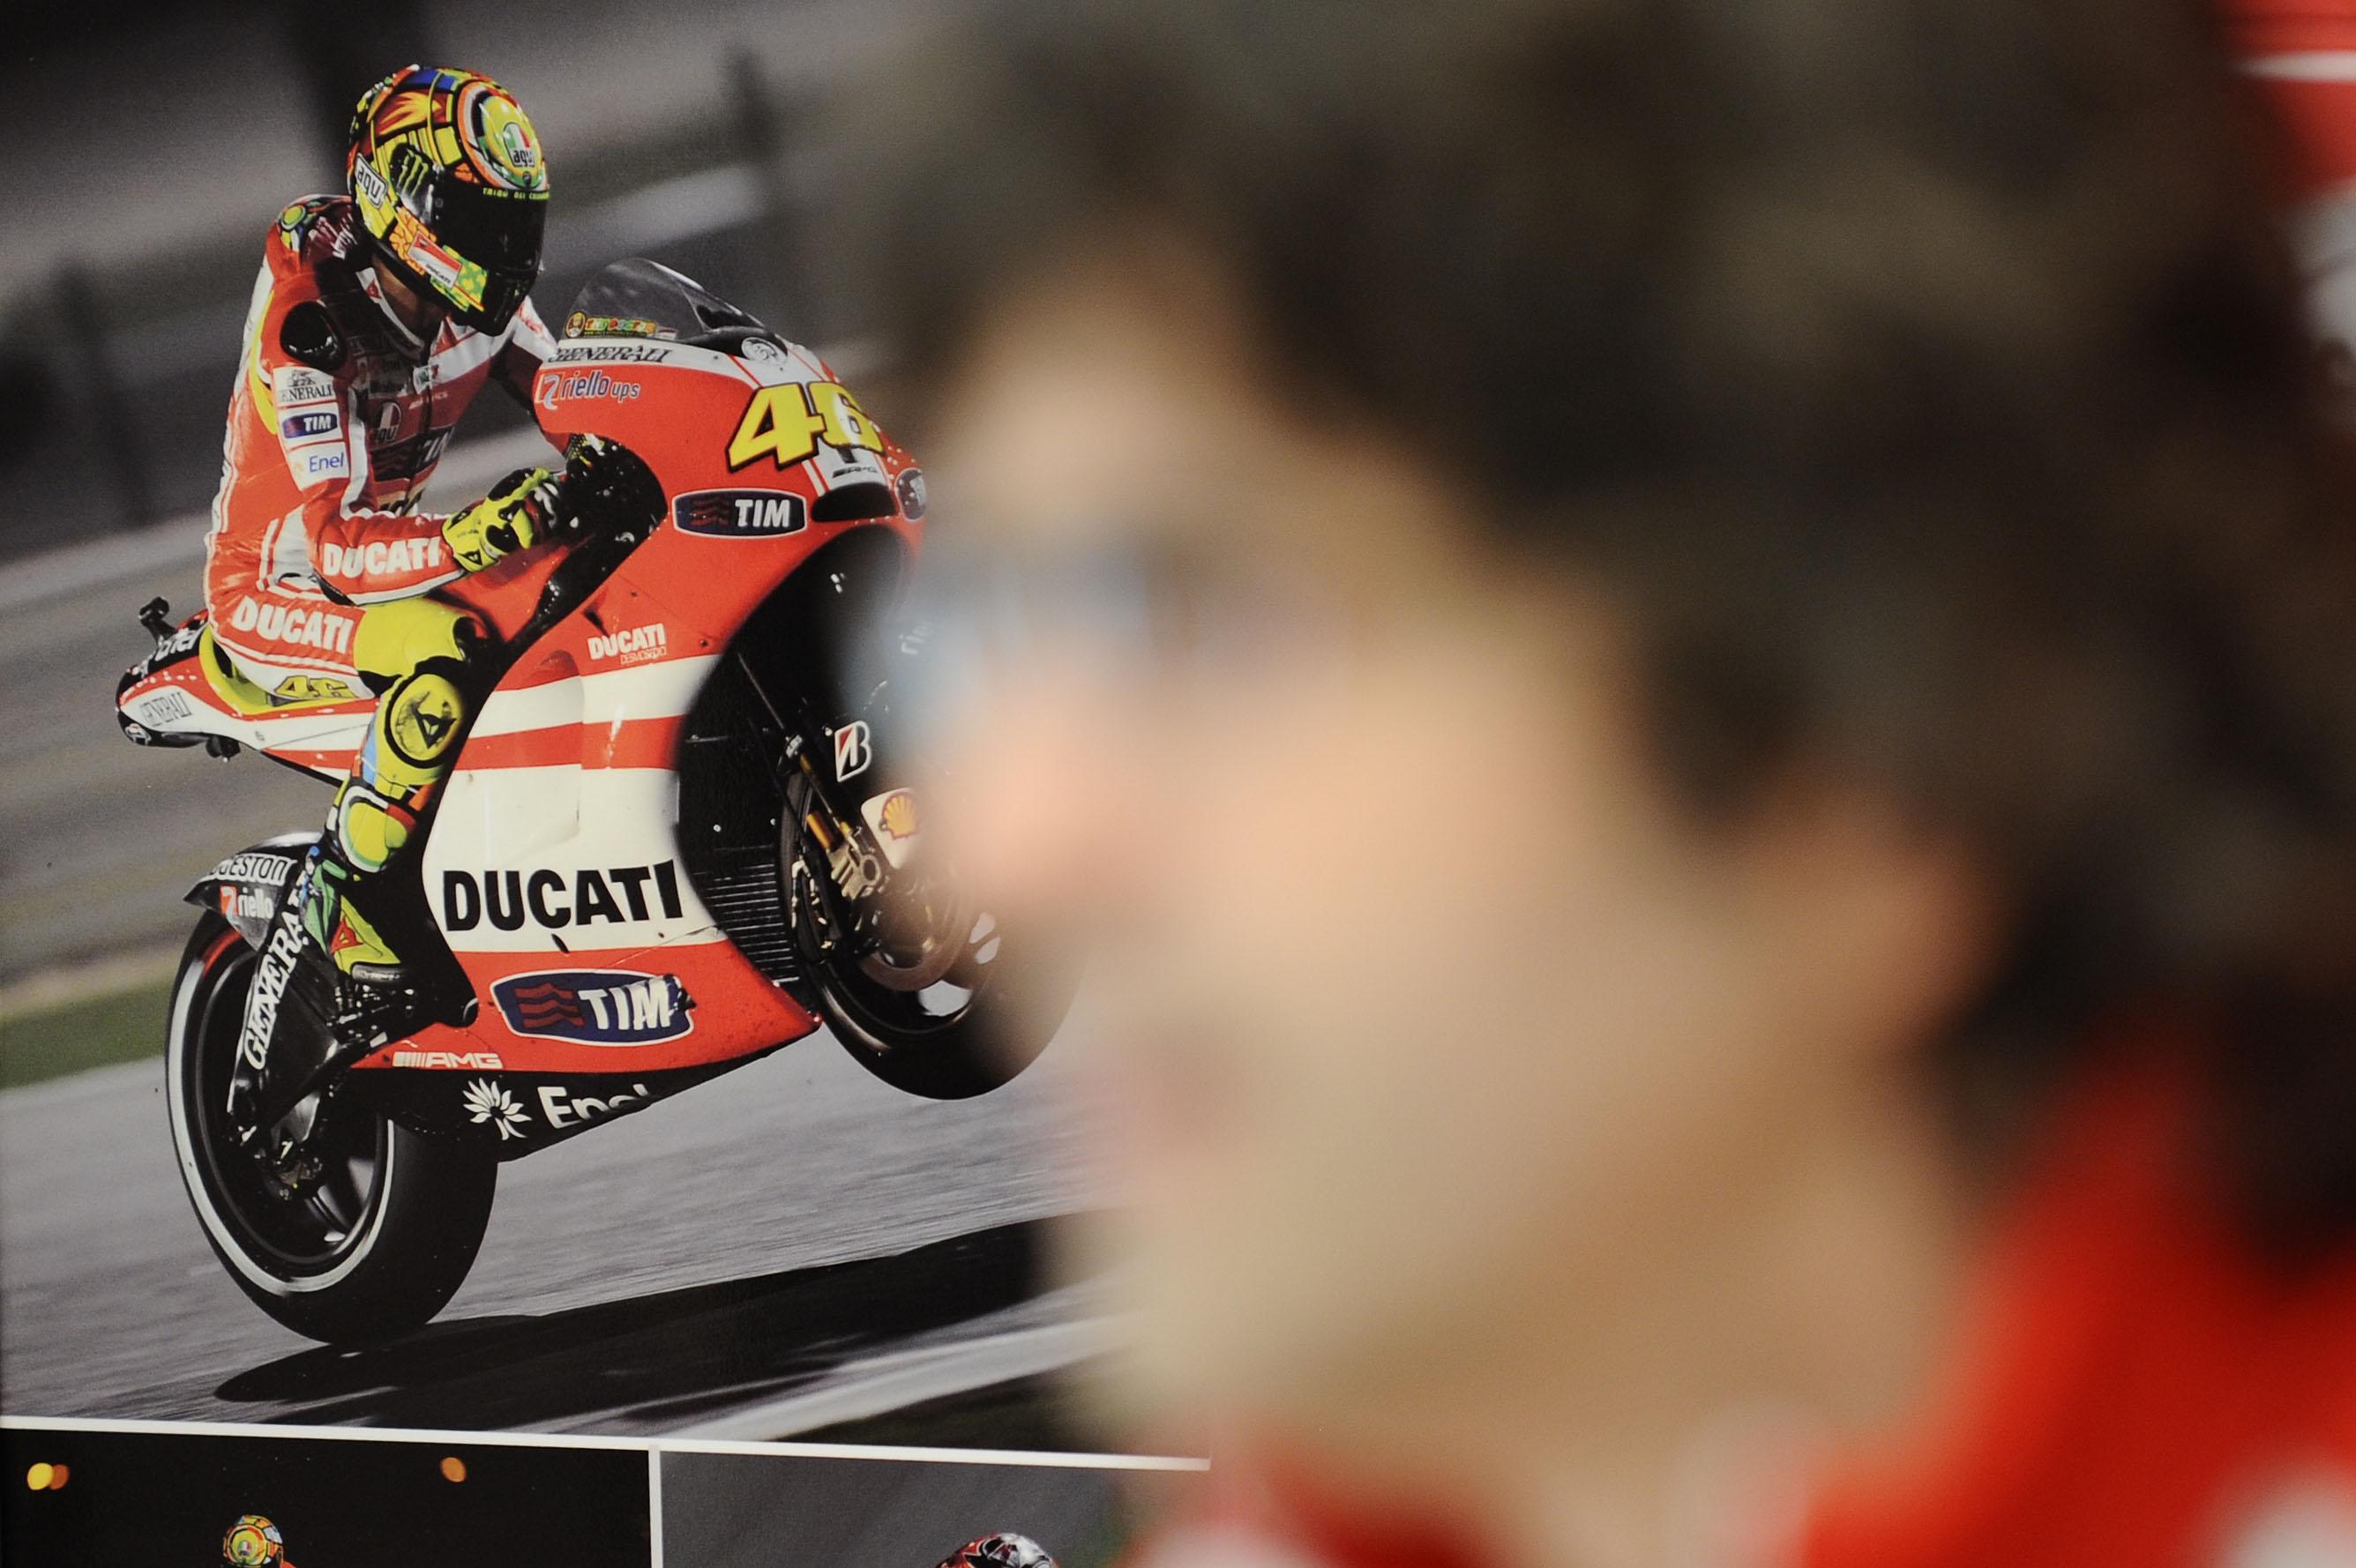 Preziosi resigns from Ducati